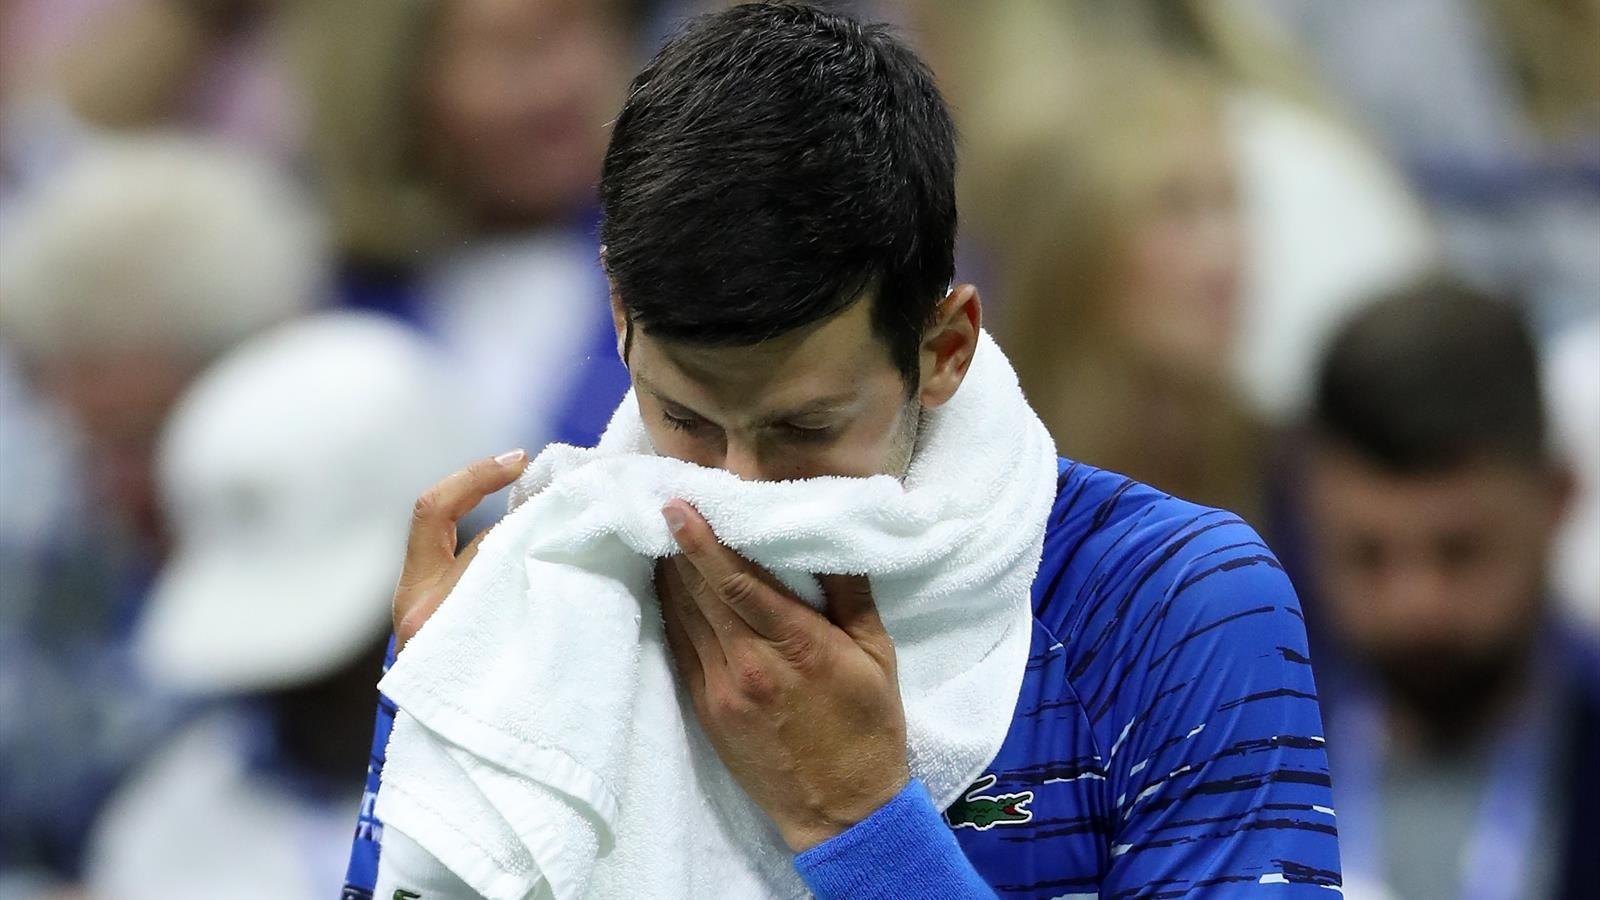 Djokovic abandona el US Open tras lesionarse ante Wawrinka